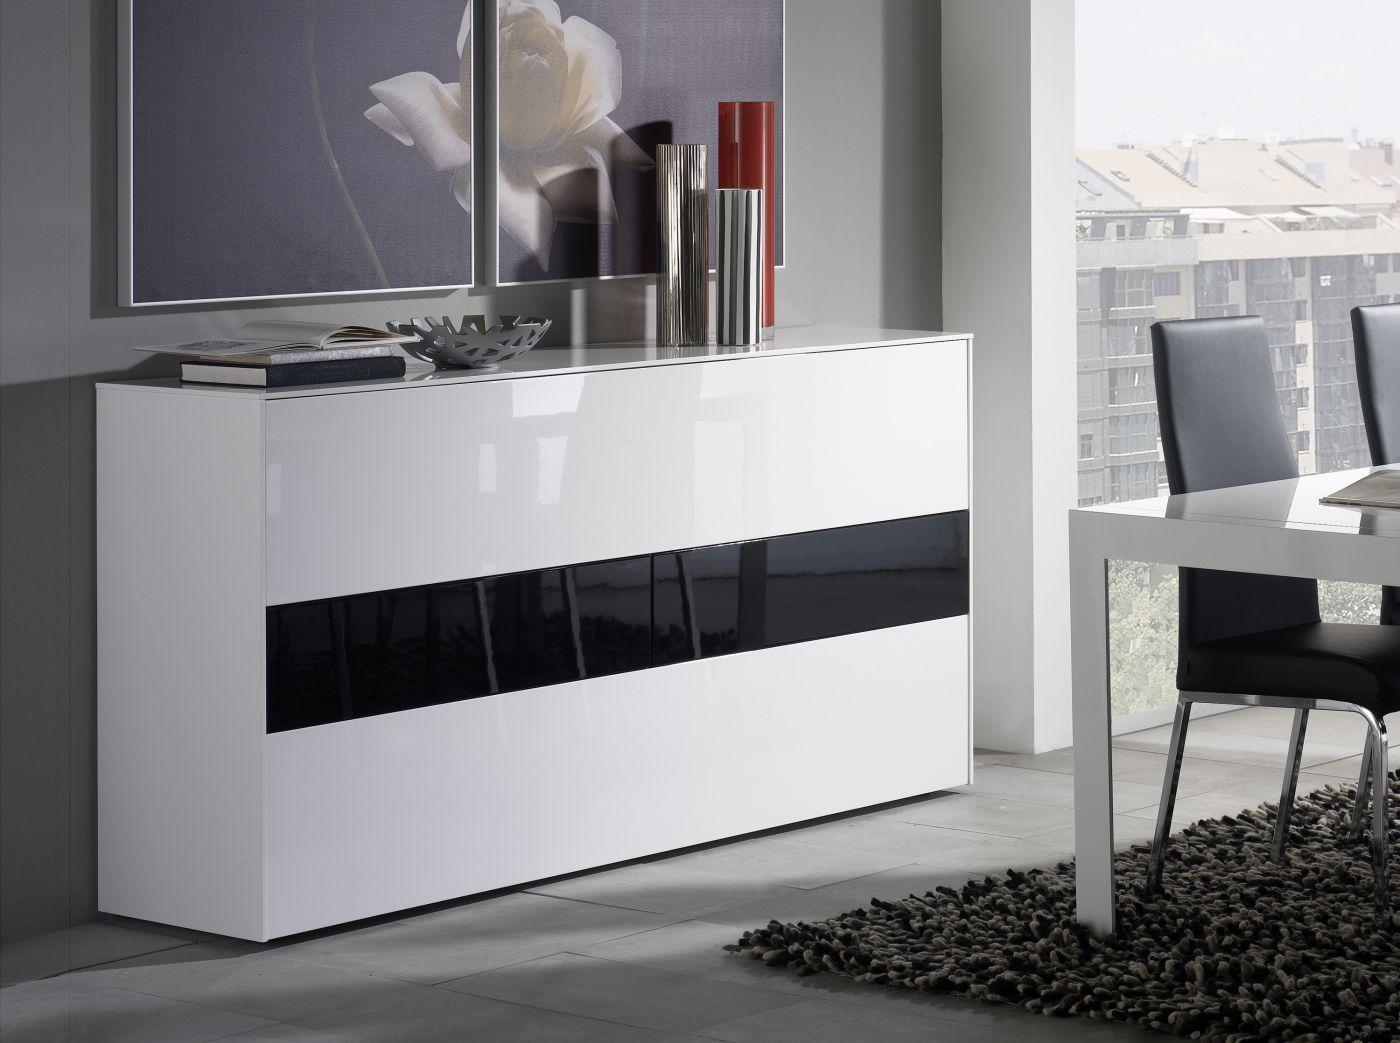 Aparadores de cocina modernos dise os arquitect nicos for Aparadores modernos